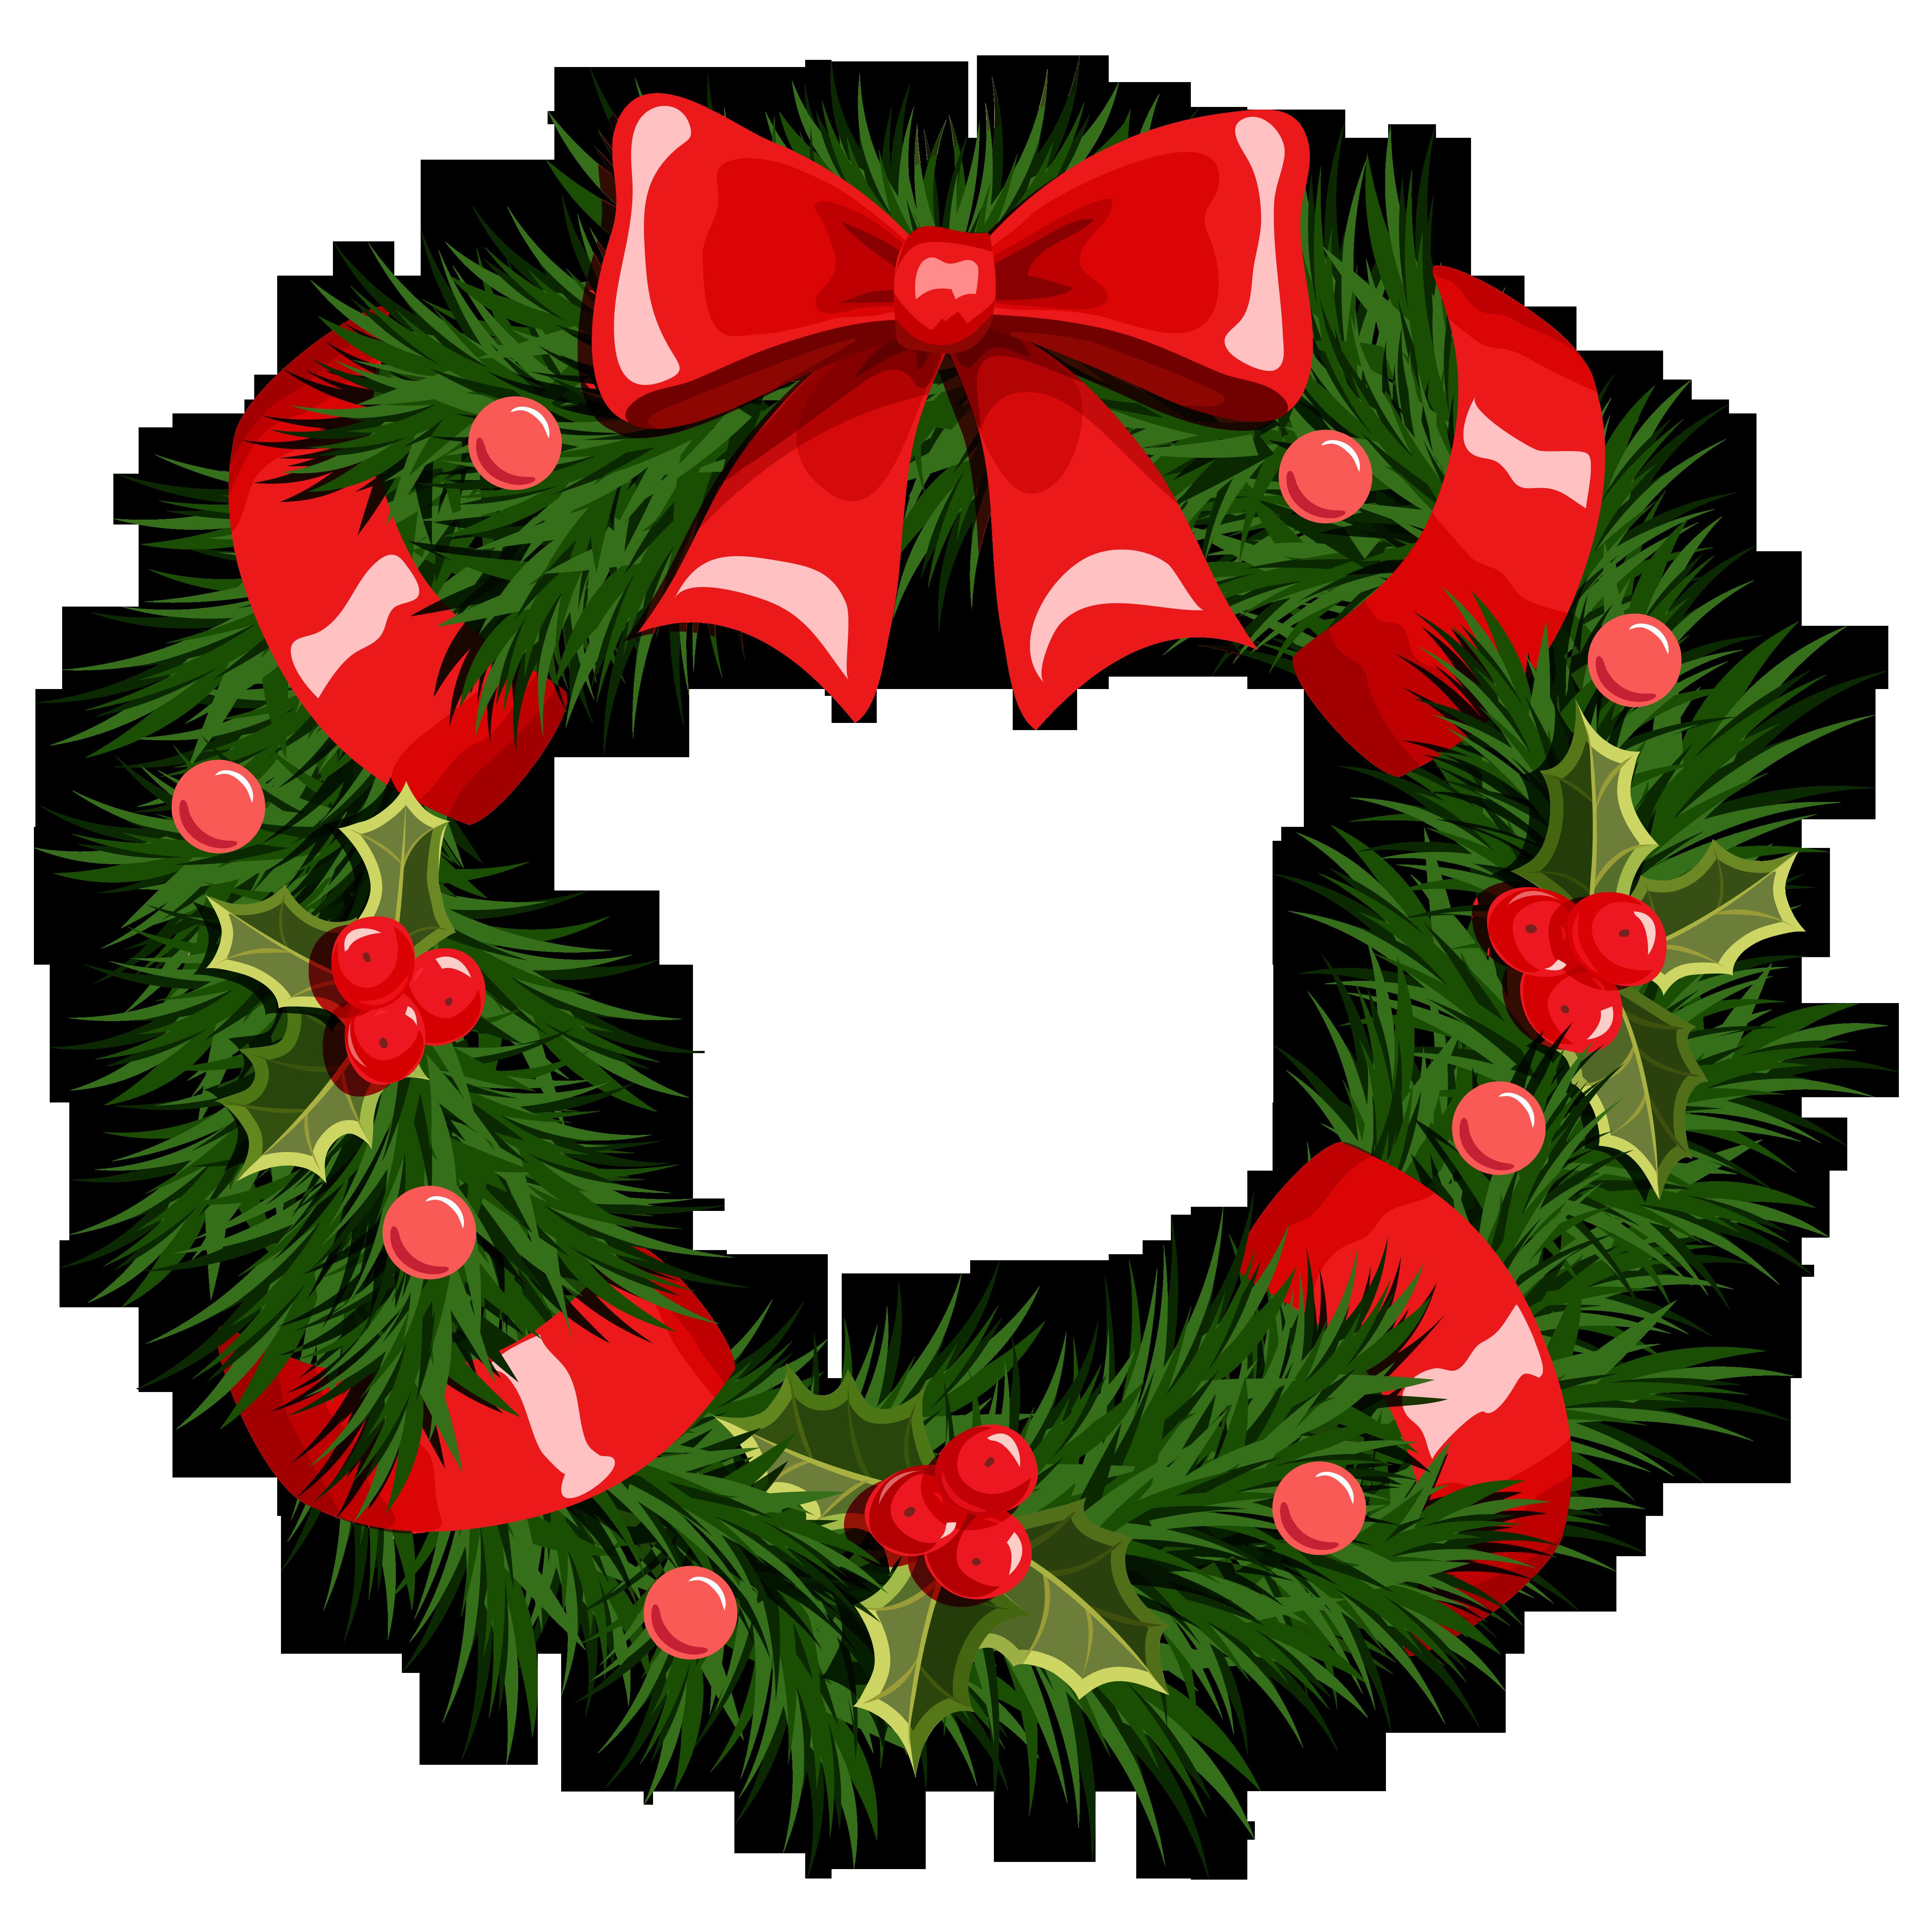 Wreath Christmas Garland Clip art.